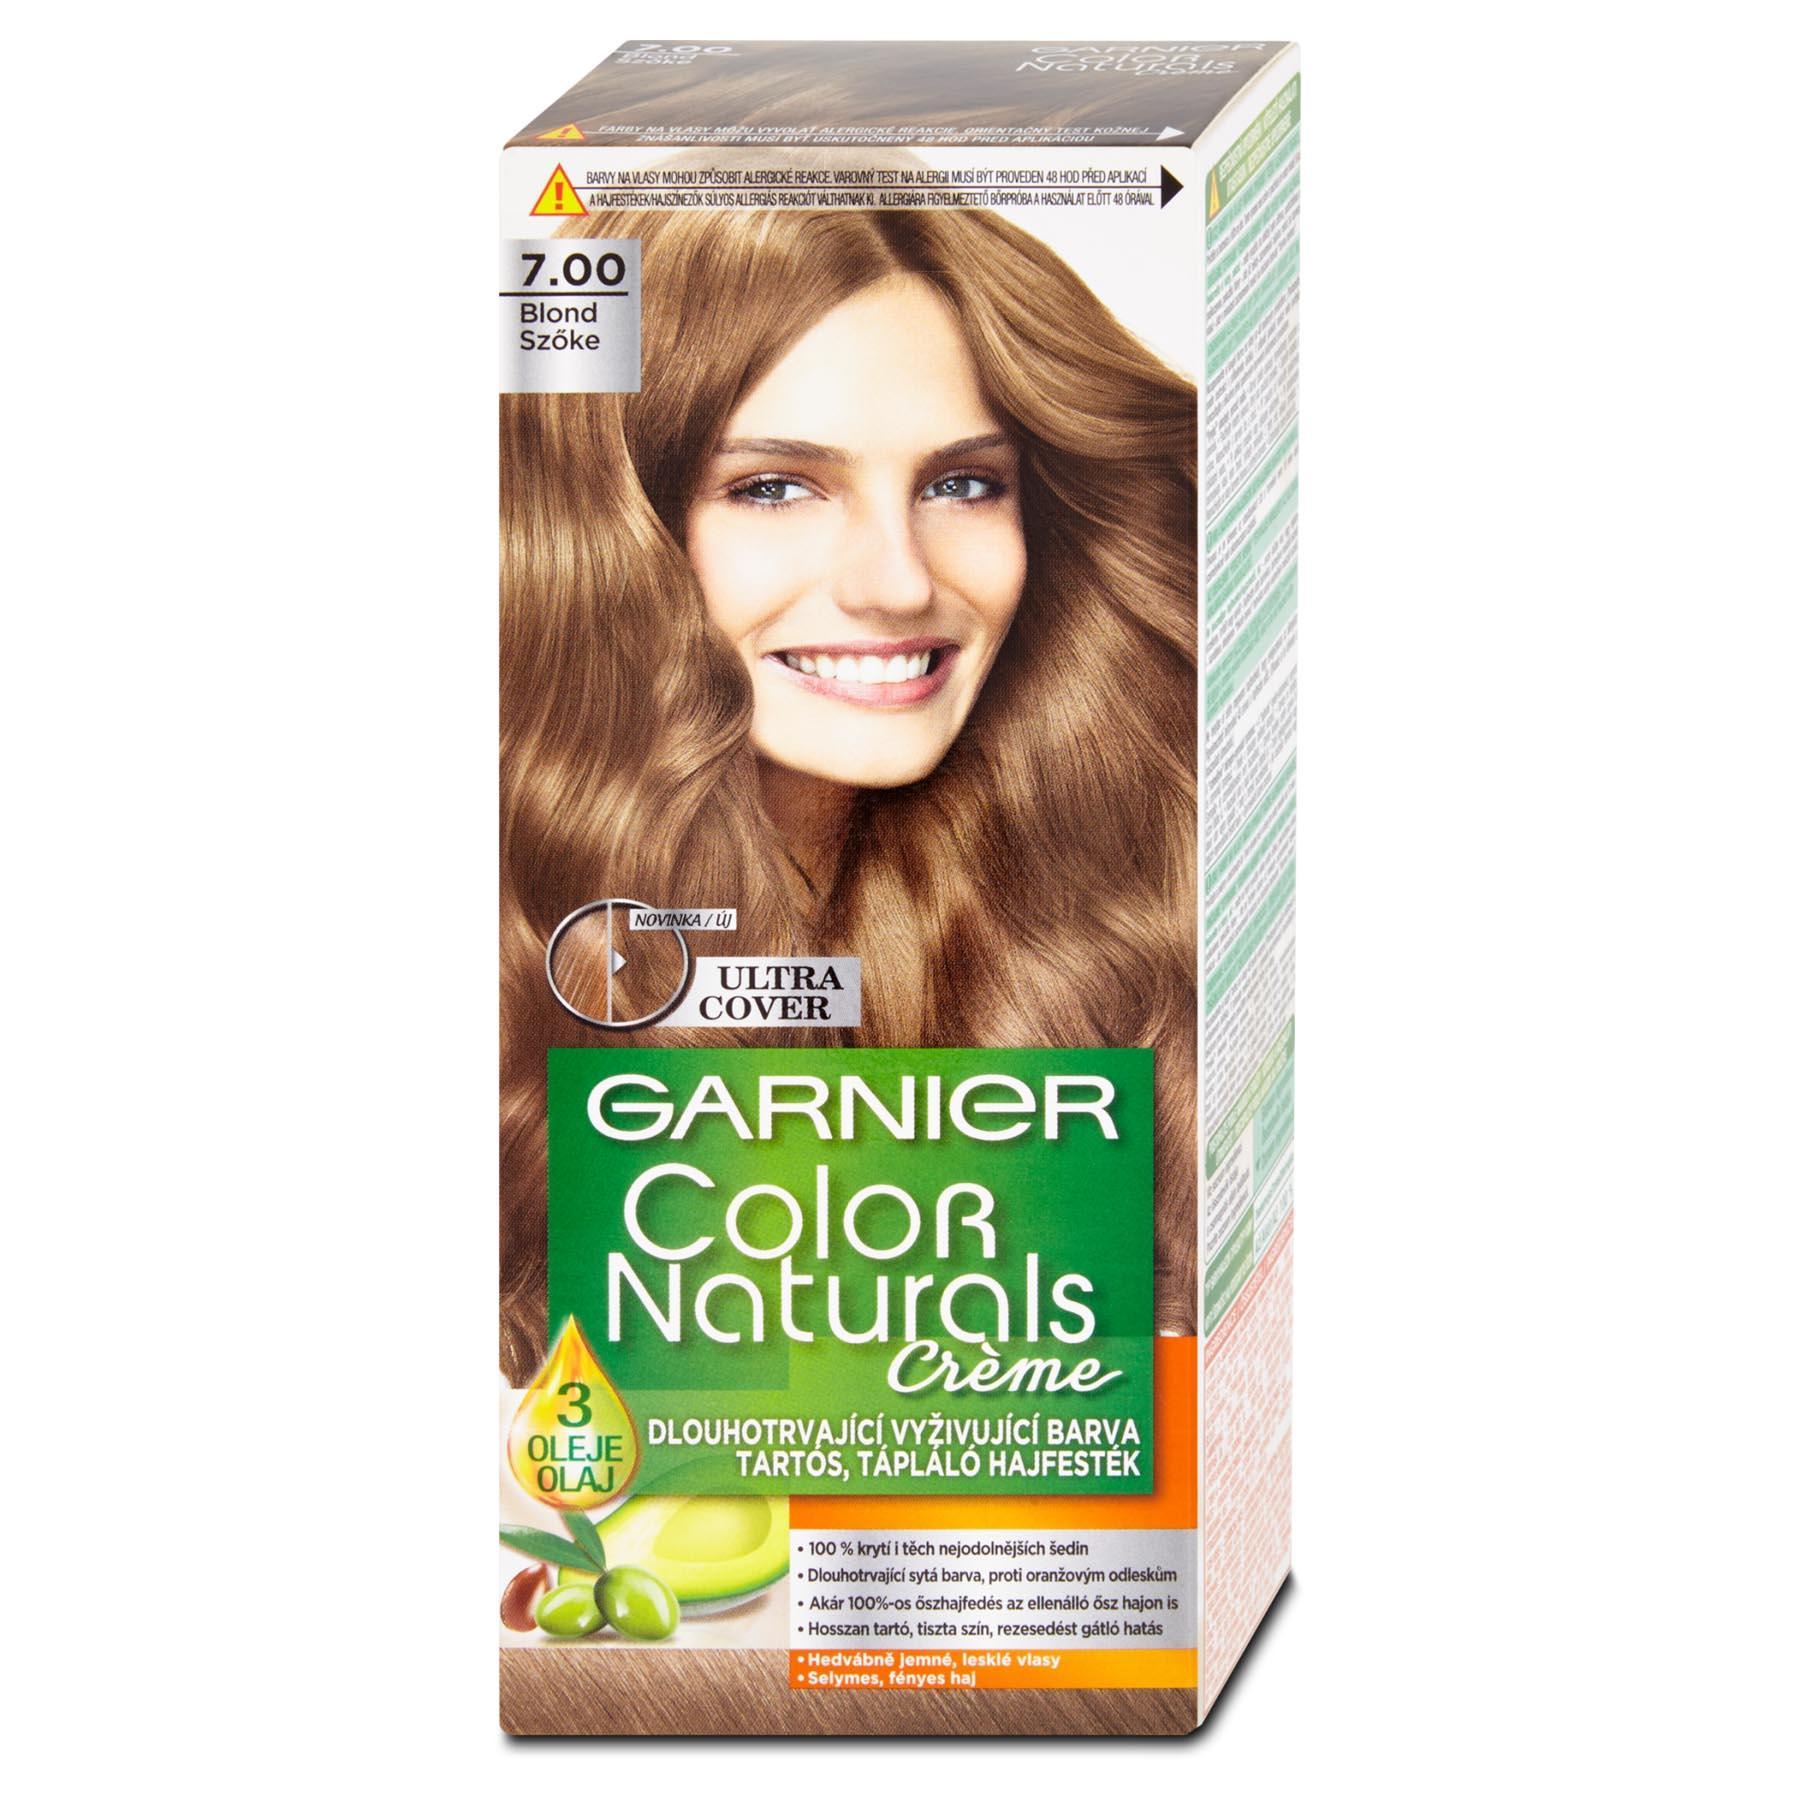 Thuốc nhuộm tóc Garnier